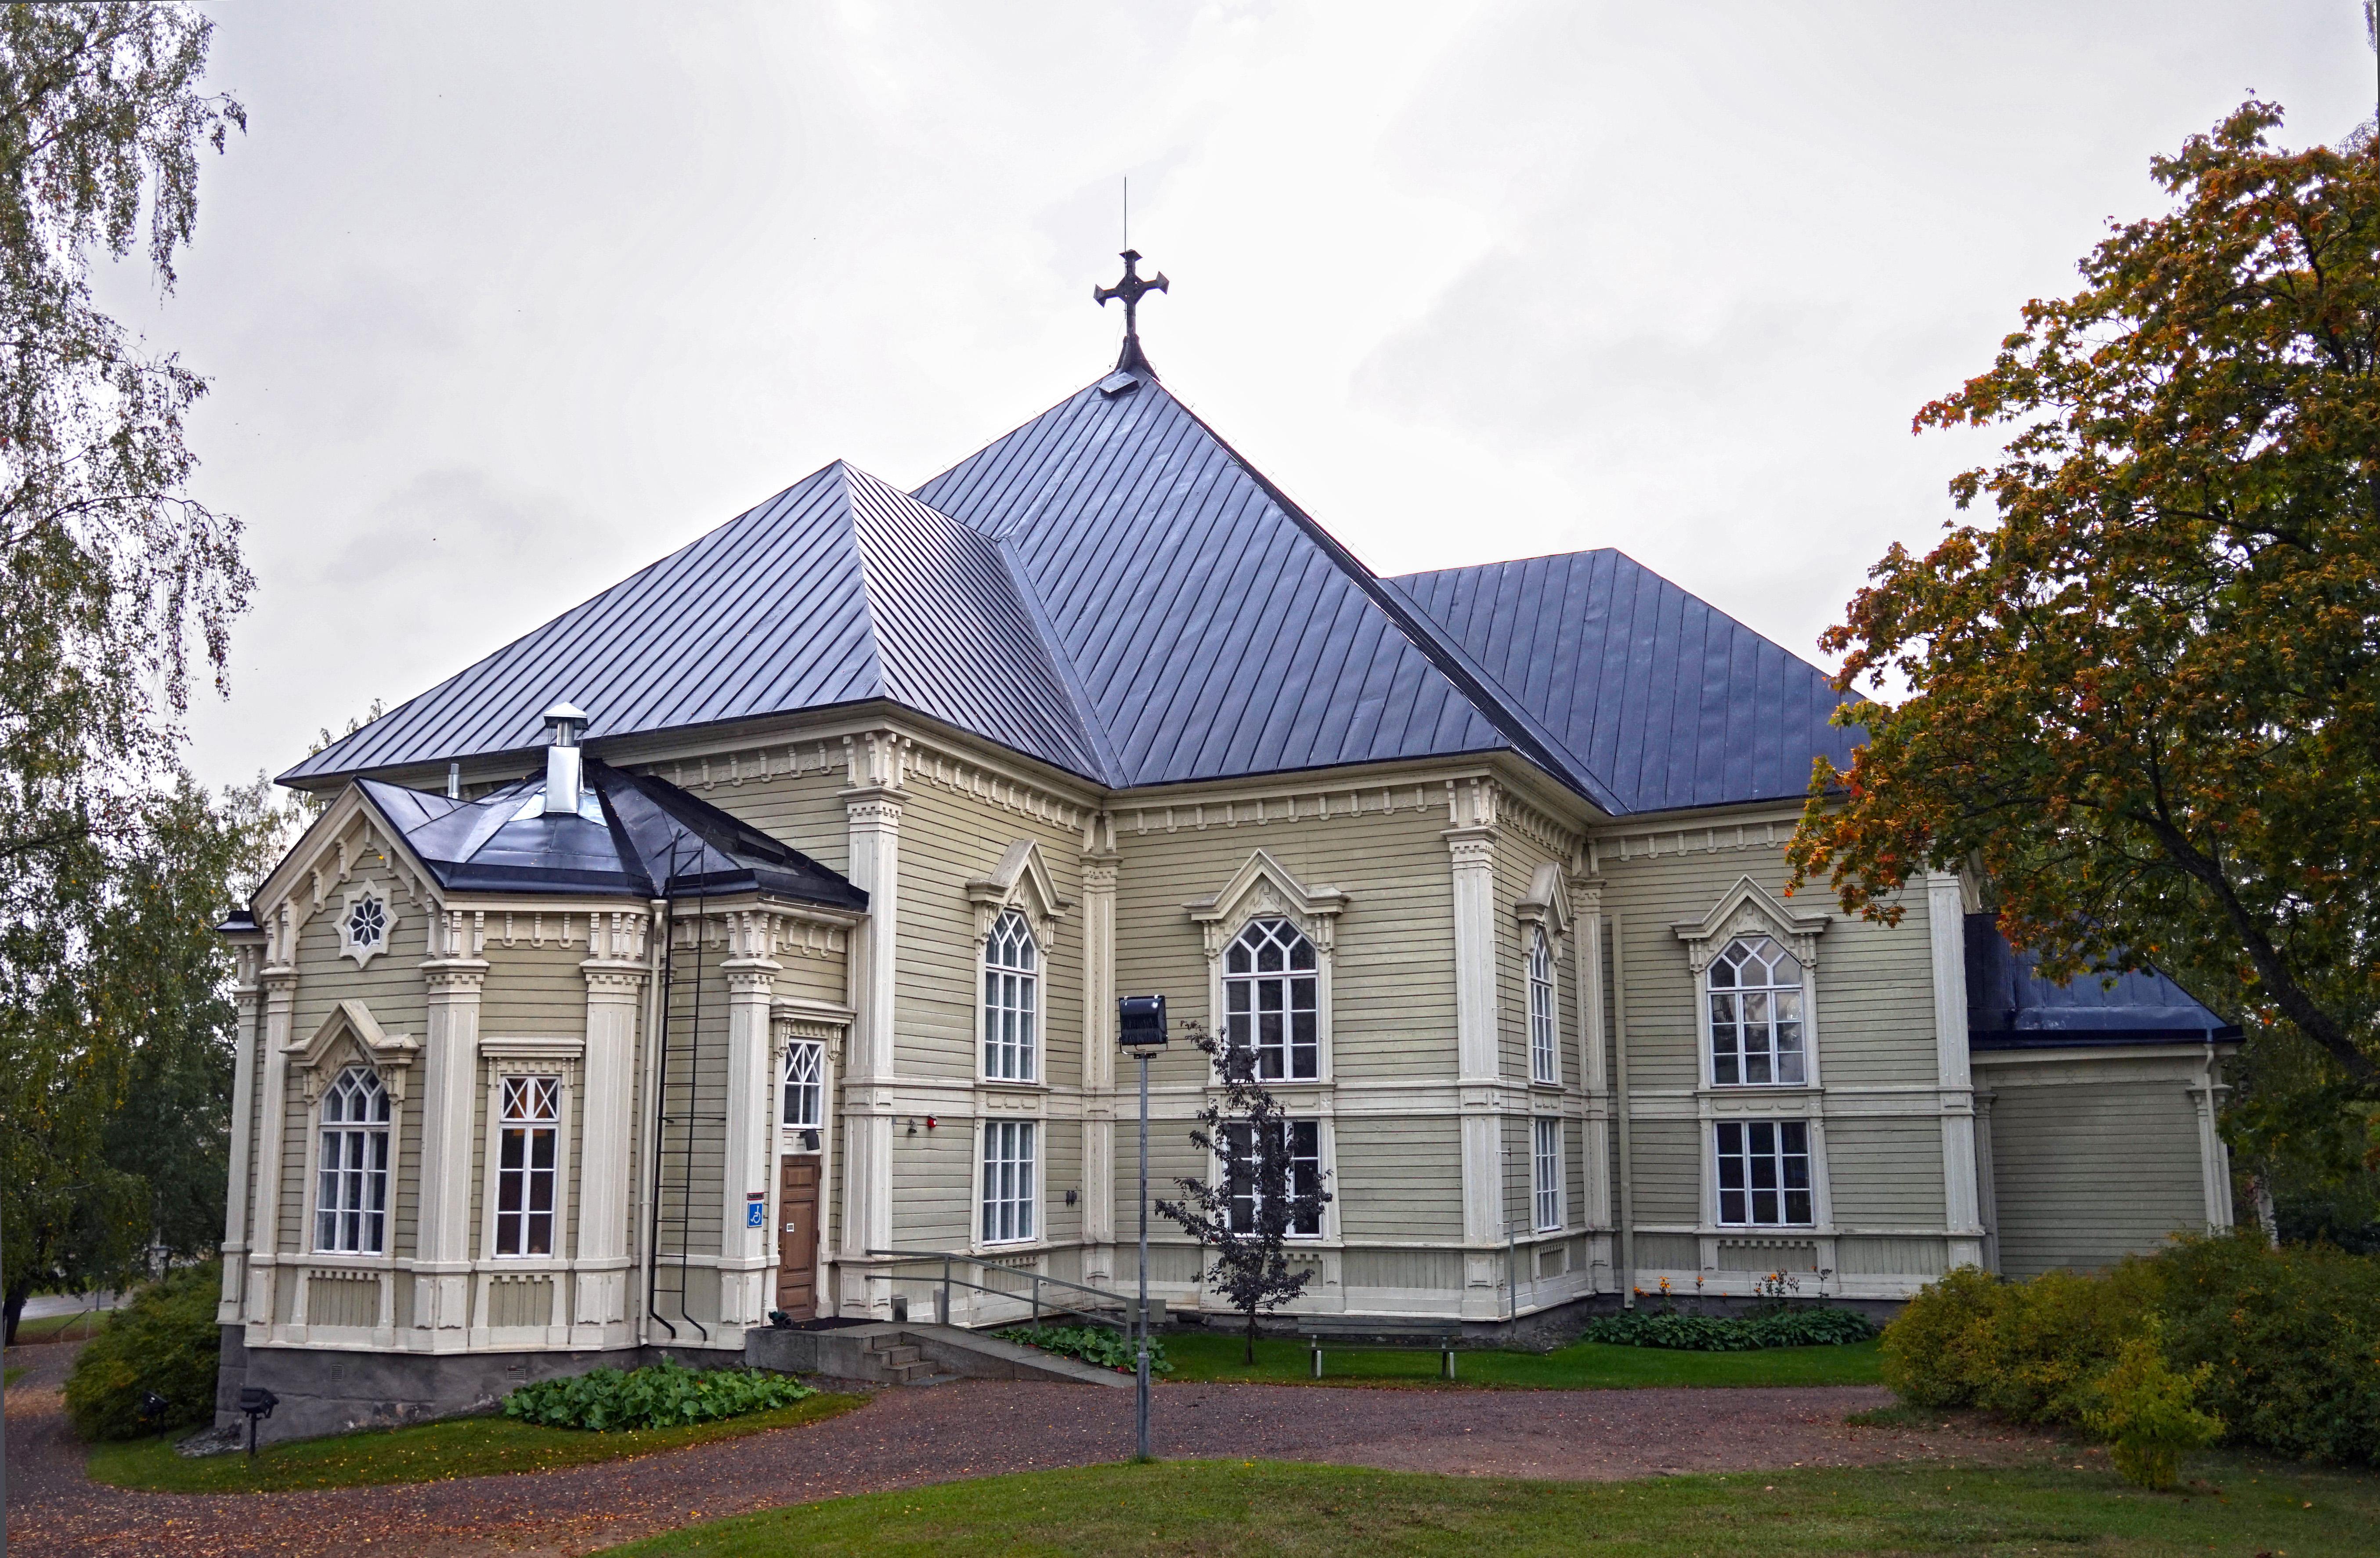 Tiedosto Kangasniemi Church Jpg Wikipedia